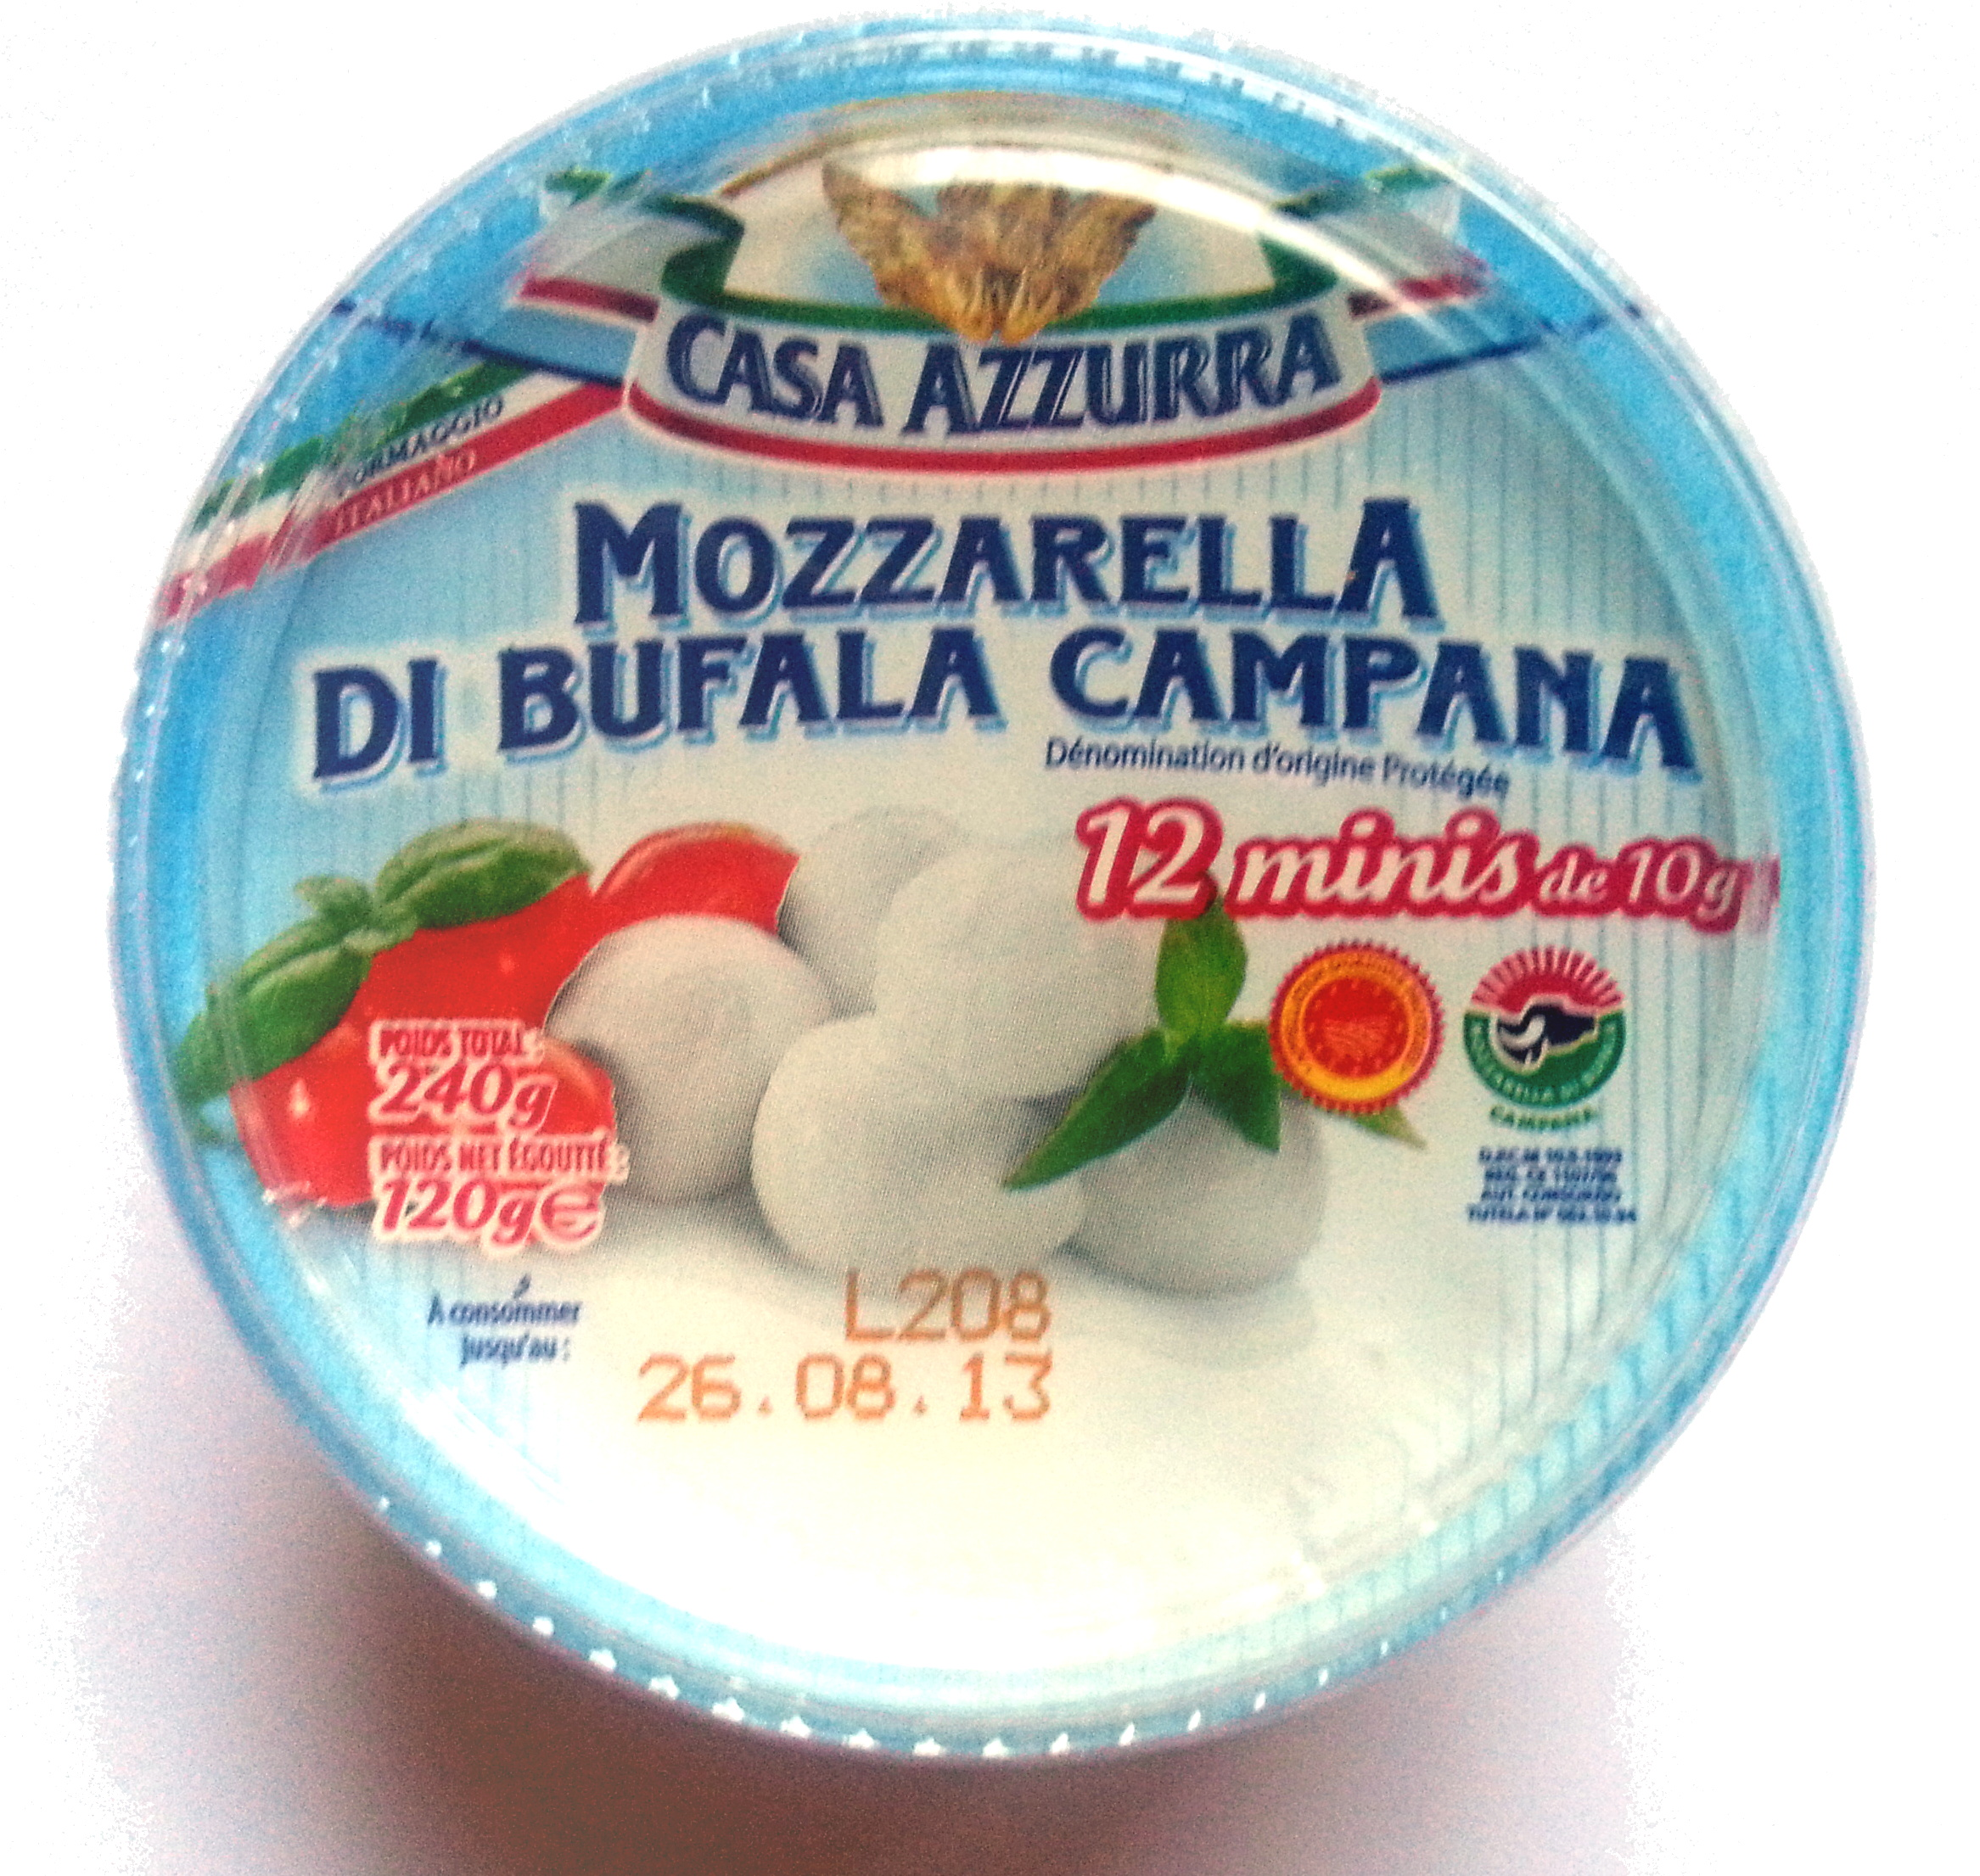 Mozzarella di Bufala Campana (22,9 % MG) - Product